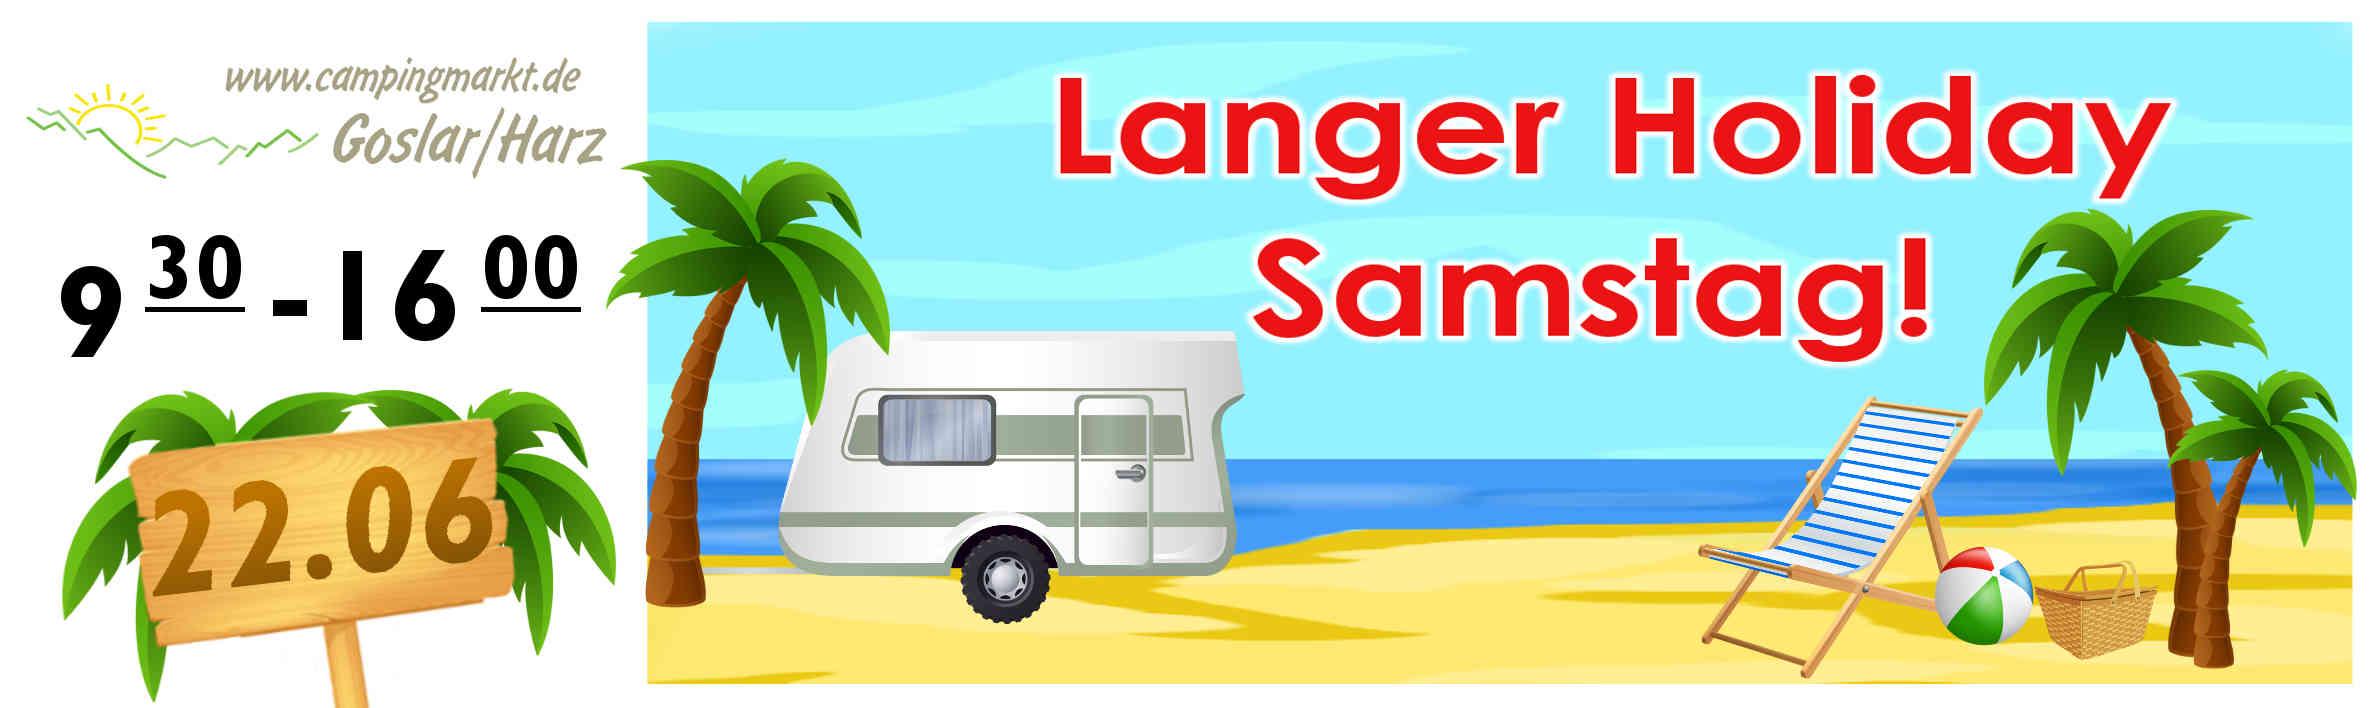 47fdae4e455810 Campingzubehör Onlineshop Campingshop Zubehoershop Campingbedarf ...